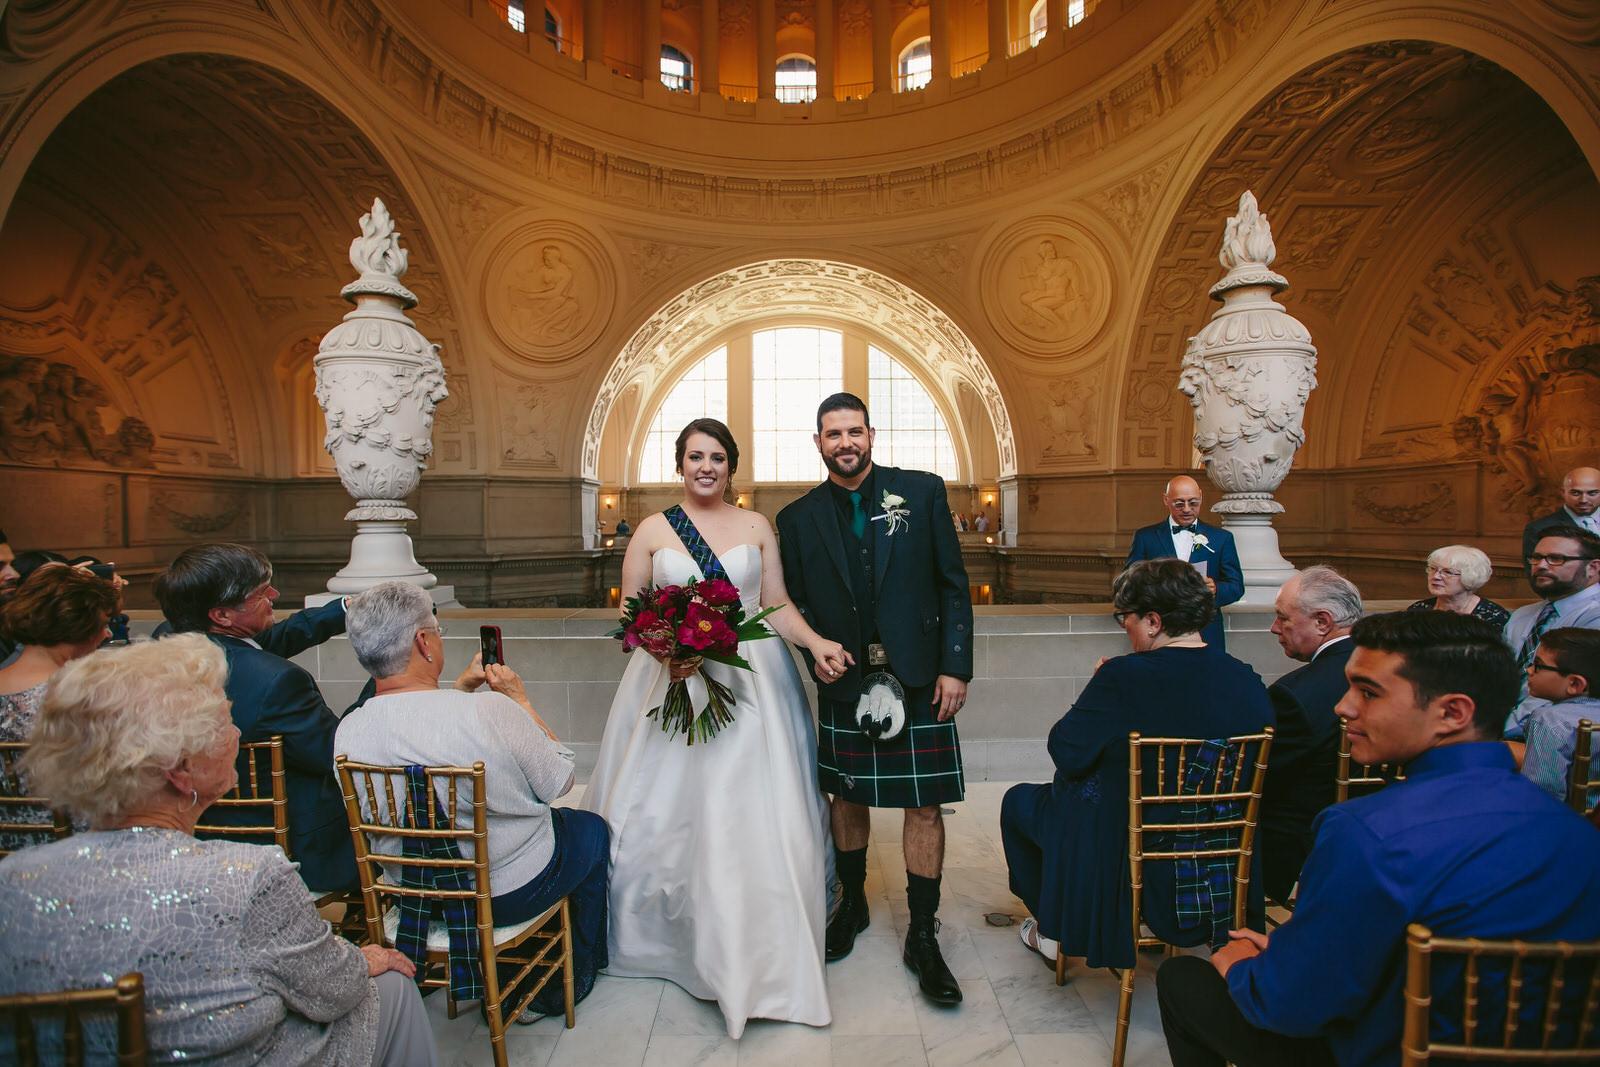 bride_groom_processional_tiny_house_photo.jpg